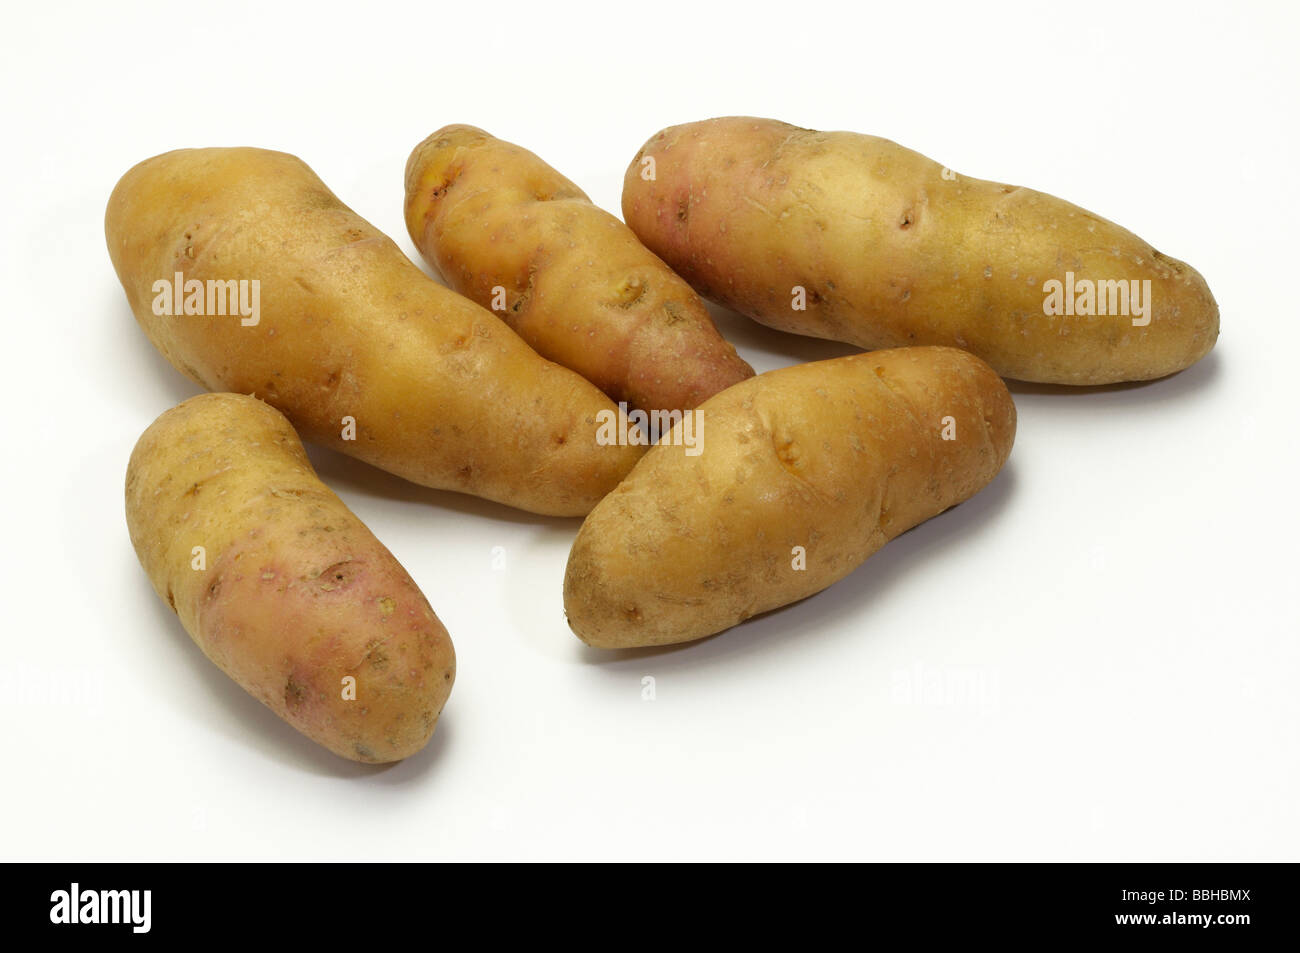 Potato (Solanum tuberosum), variety: Bamberger Hoernchen, studio picture Stock Photo